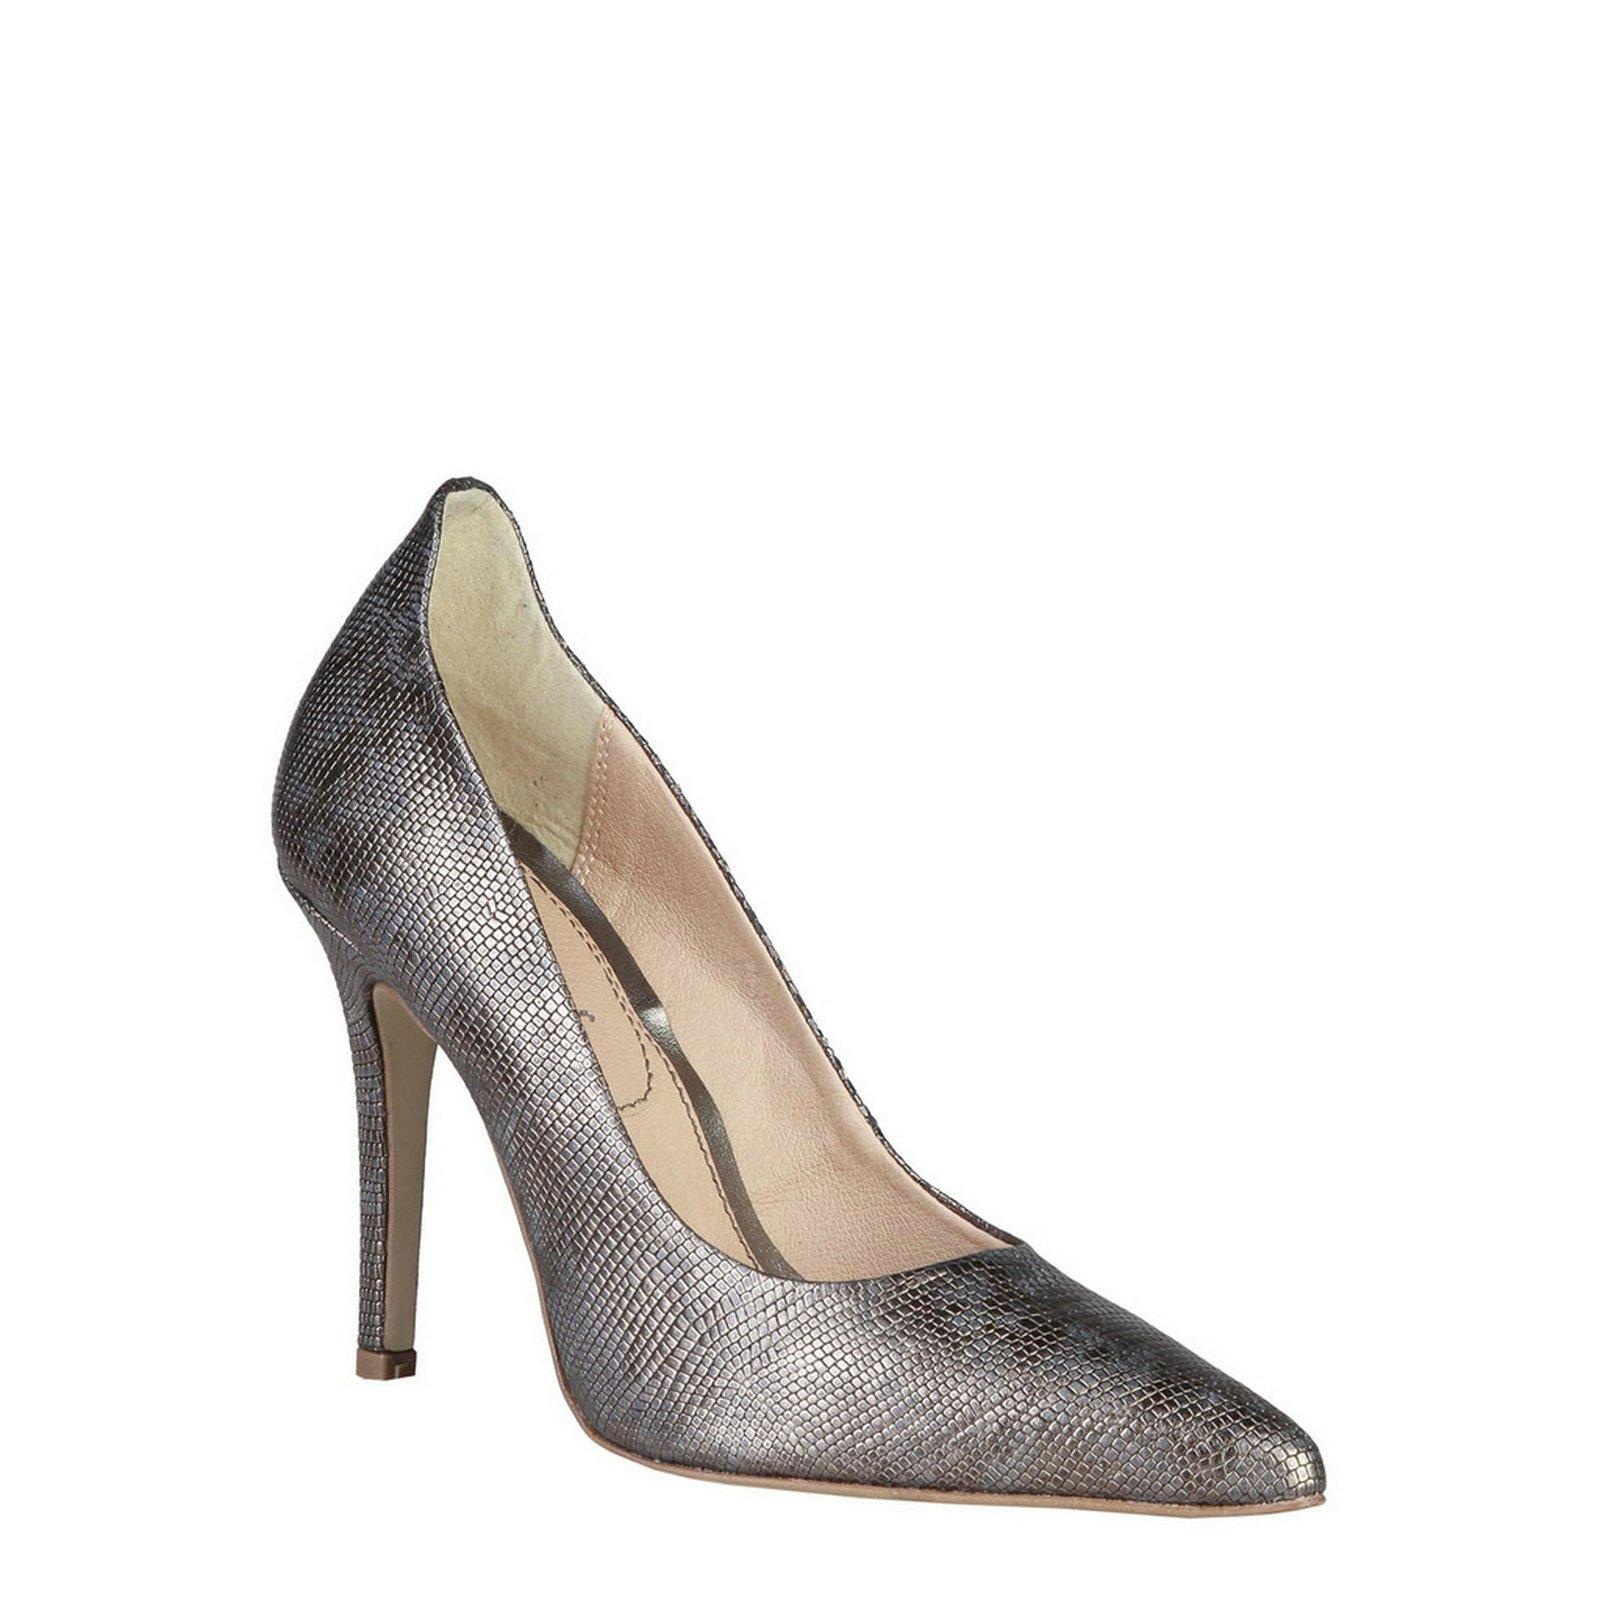 New Women's Pierre Cardin High Heel Pumps Shoes US 8.5